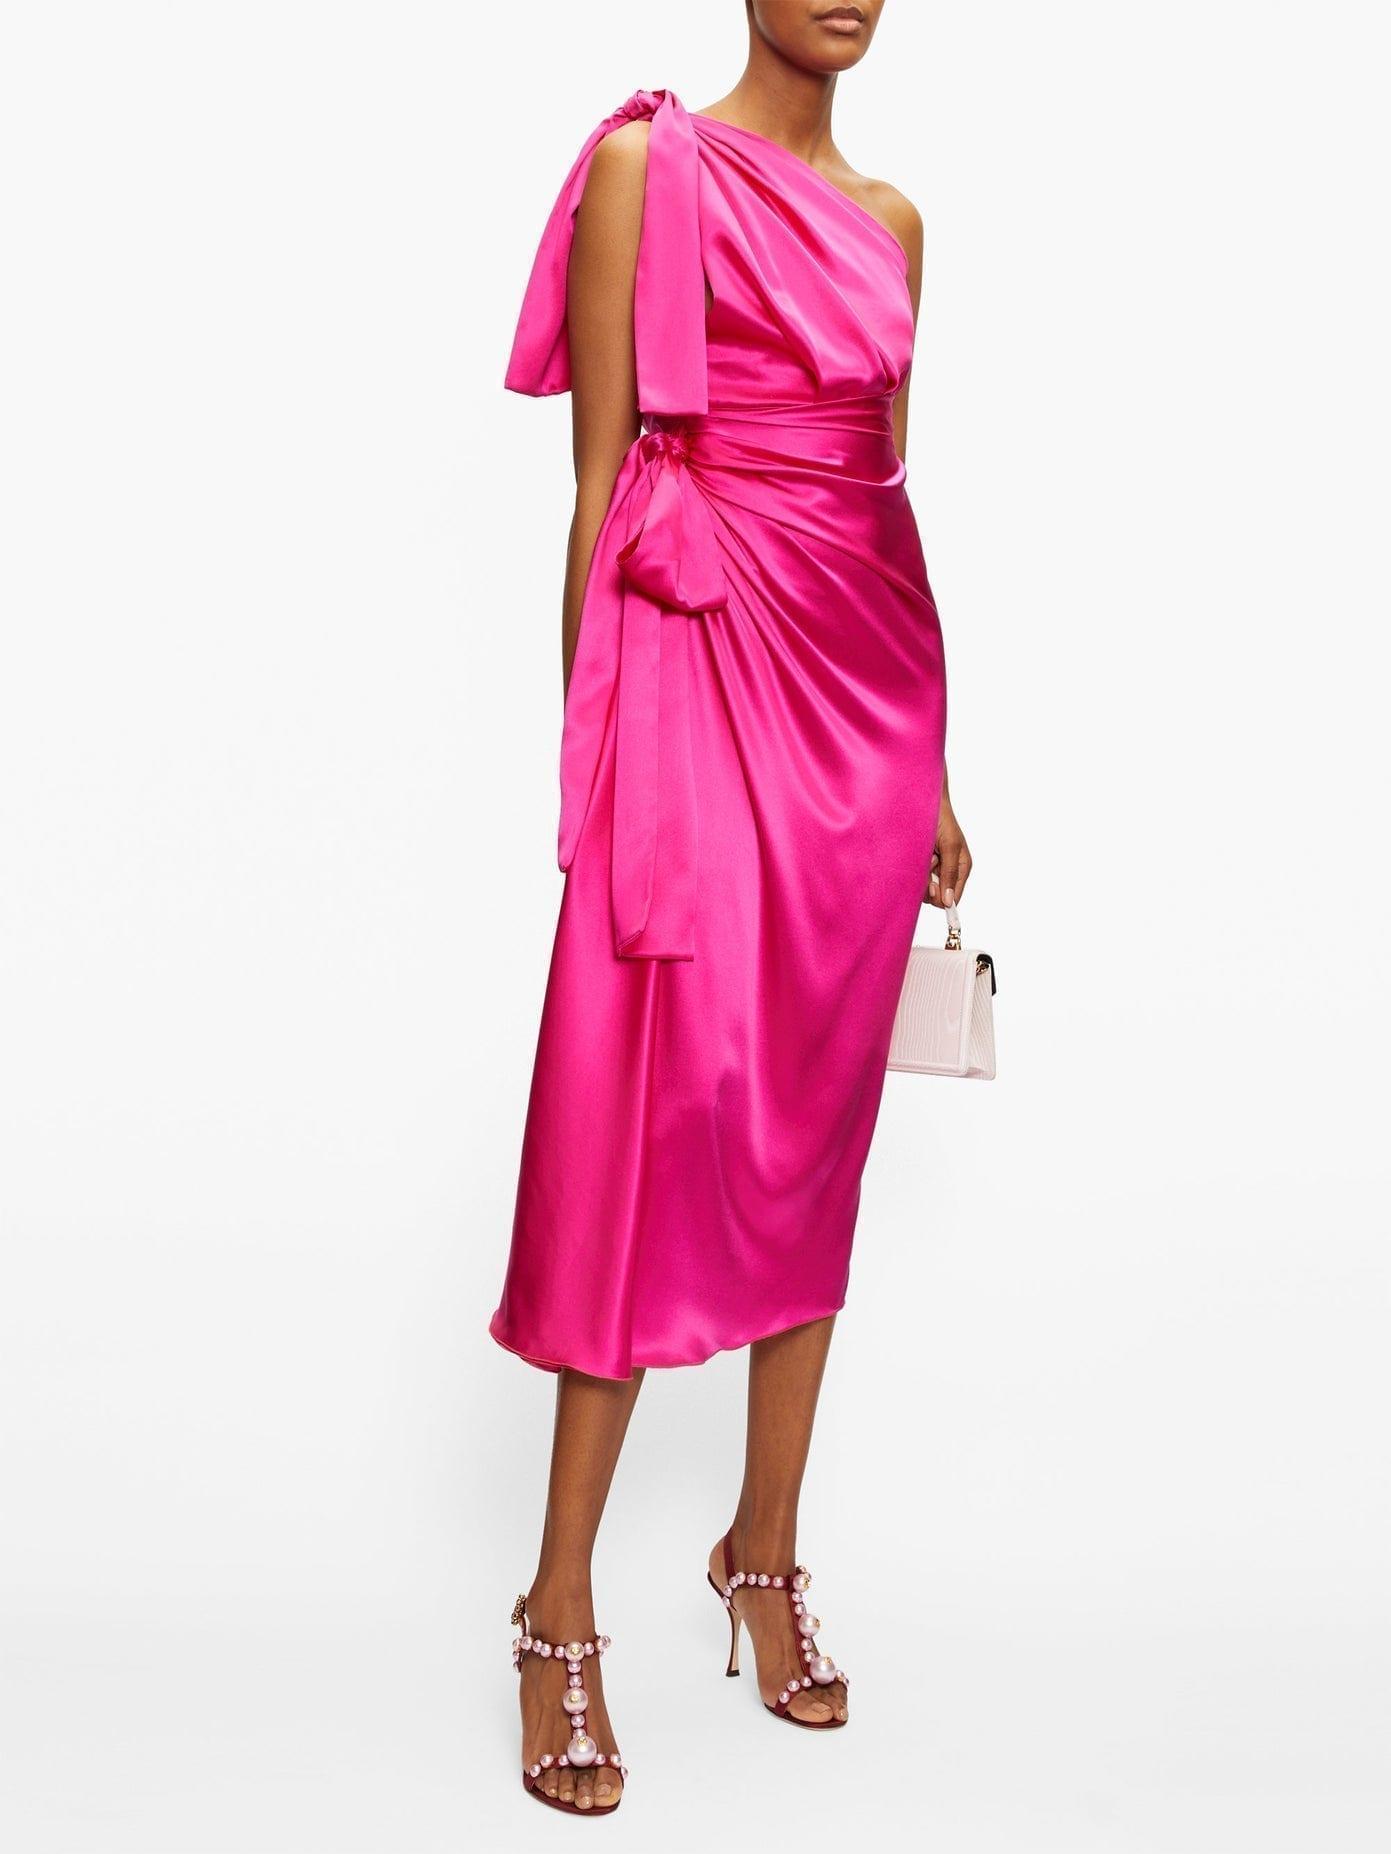 DOLCE & GABBANA Asymmetric Knotted Silk-satin Dress